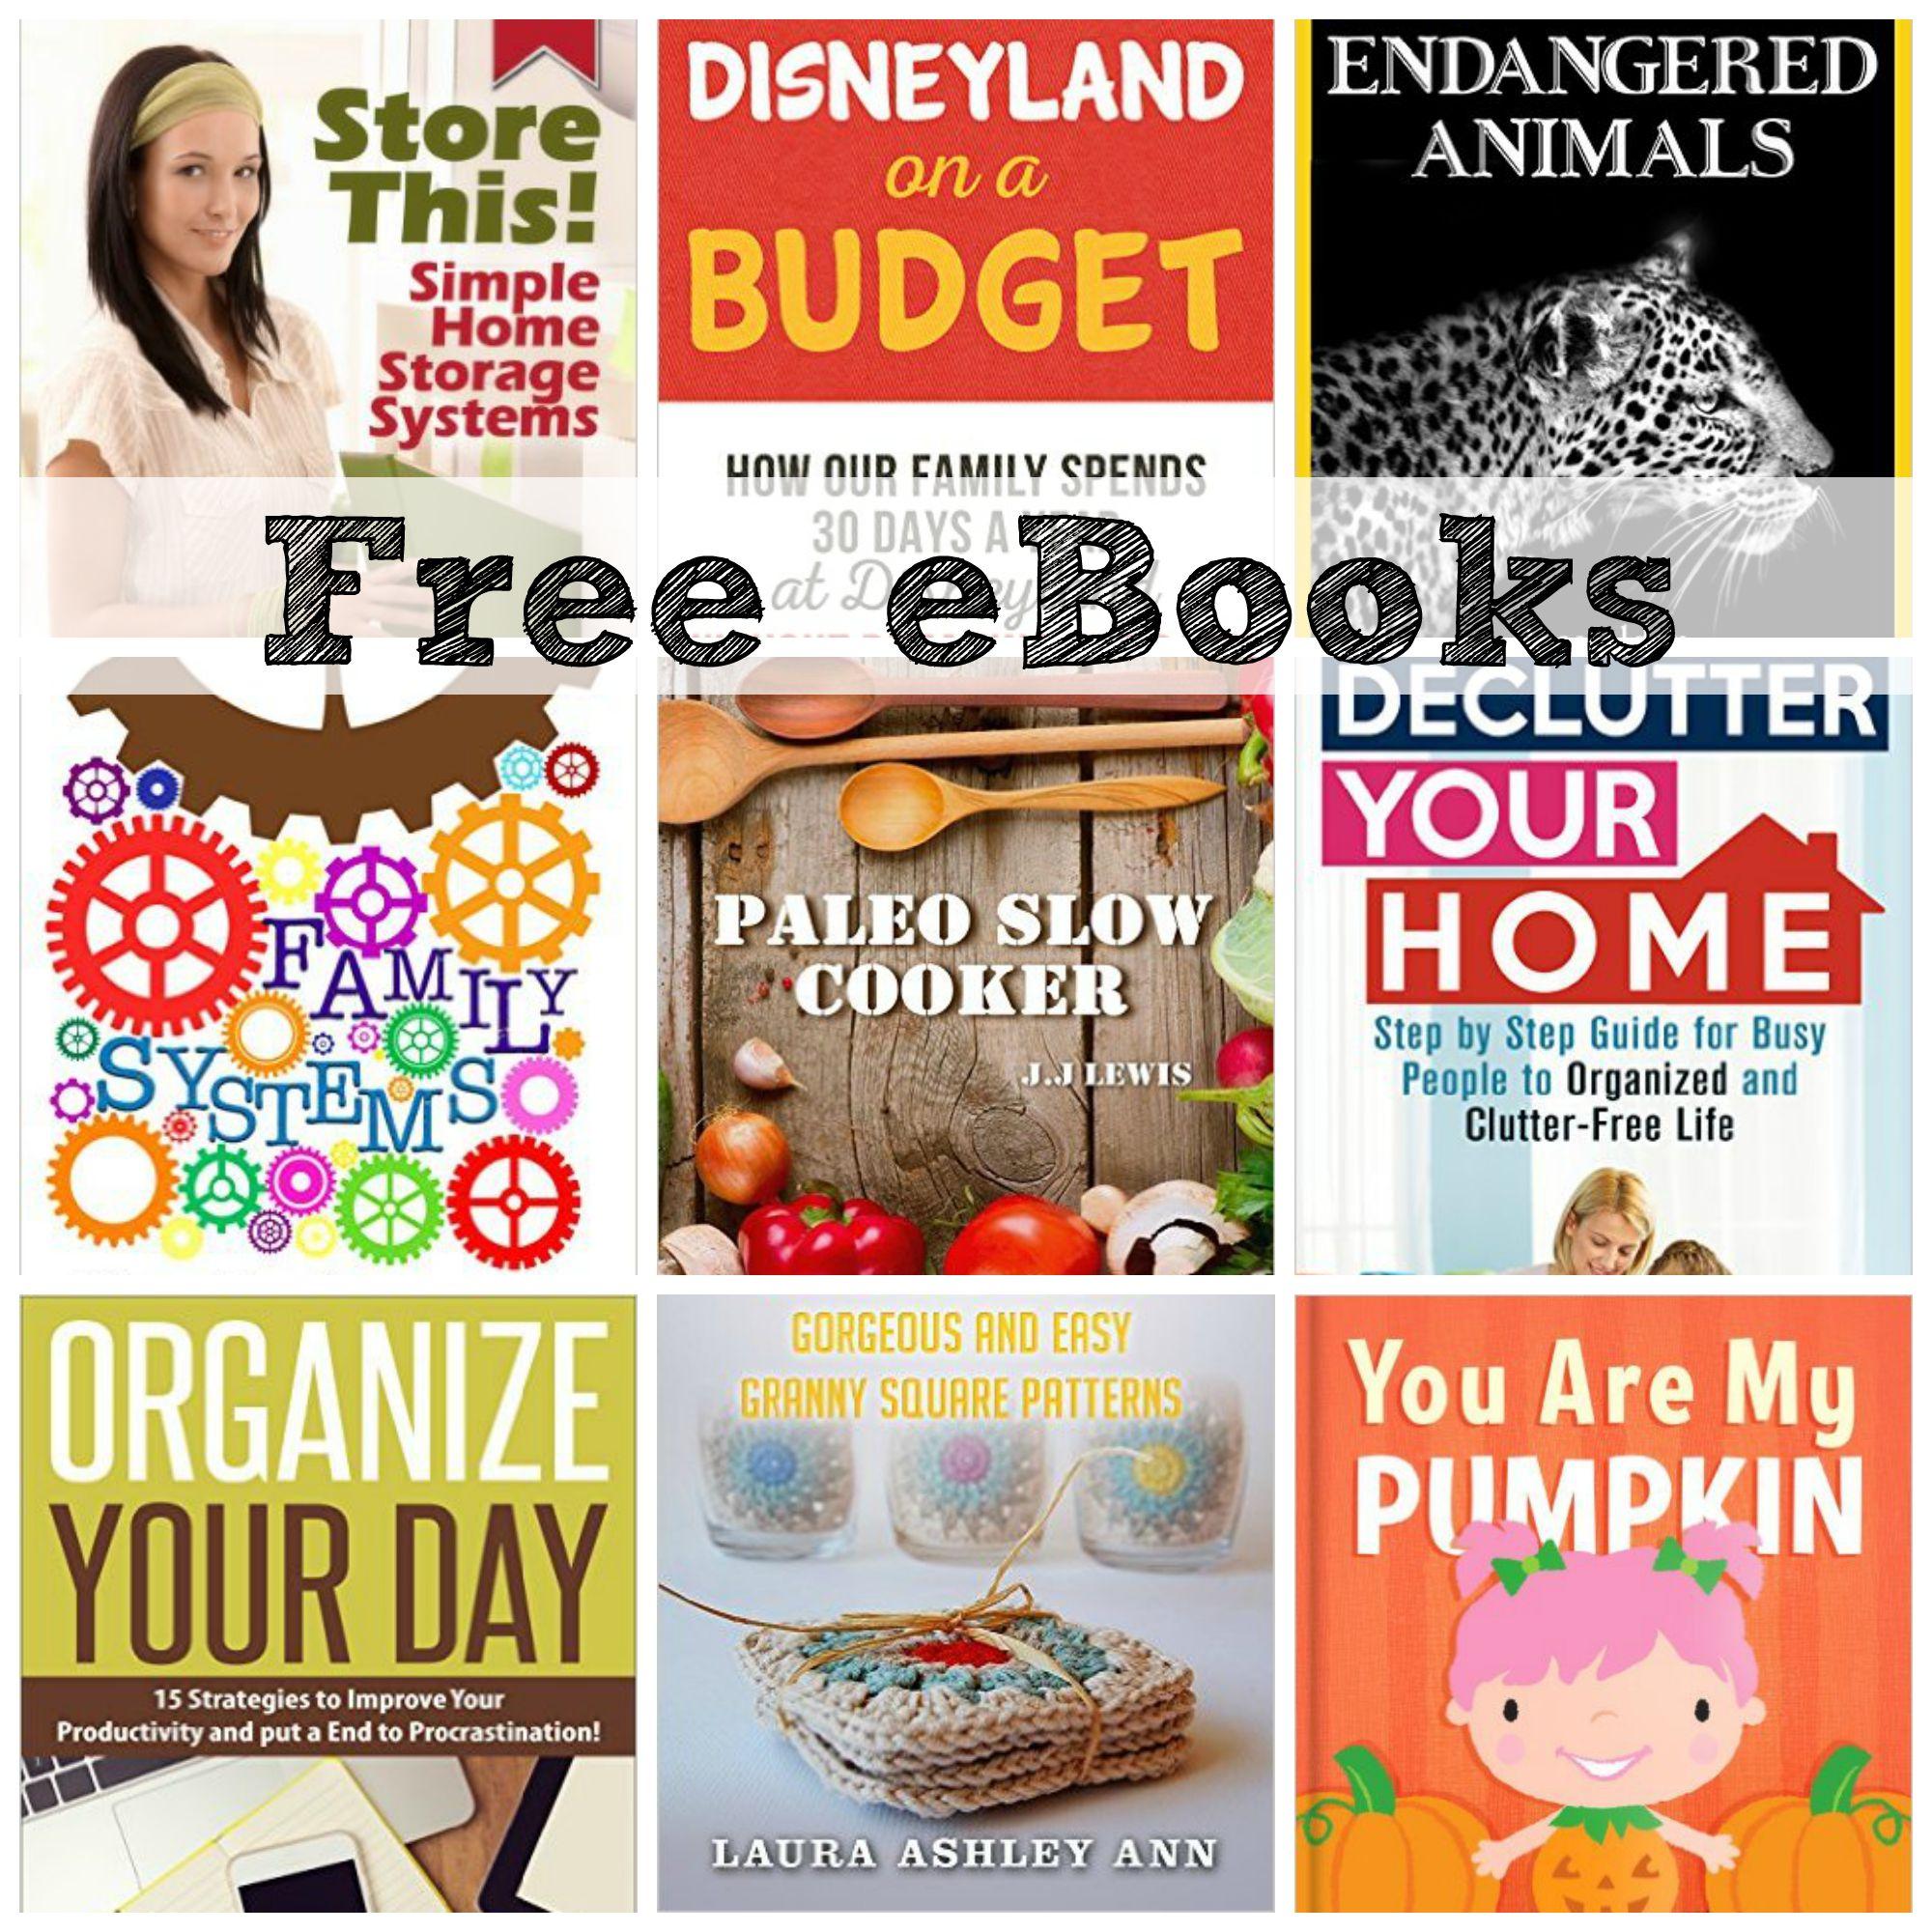 Free Ebooks Disneyland On A Budget Discover Endangered